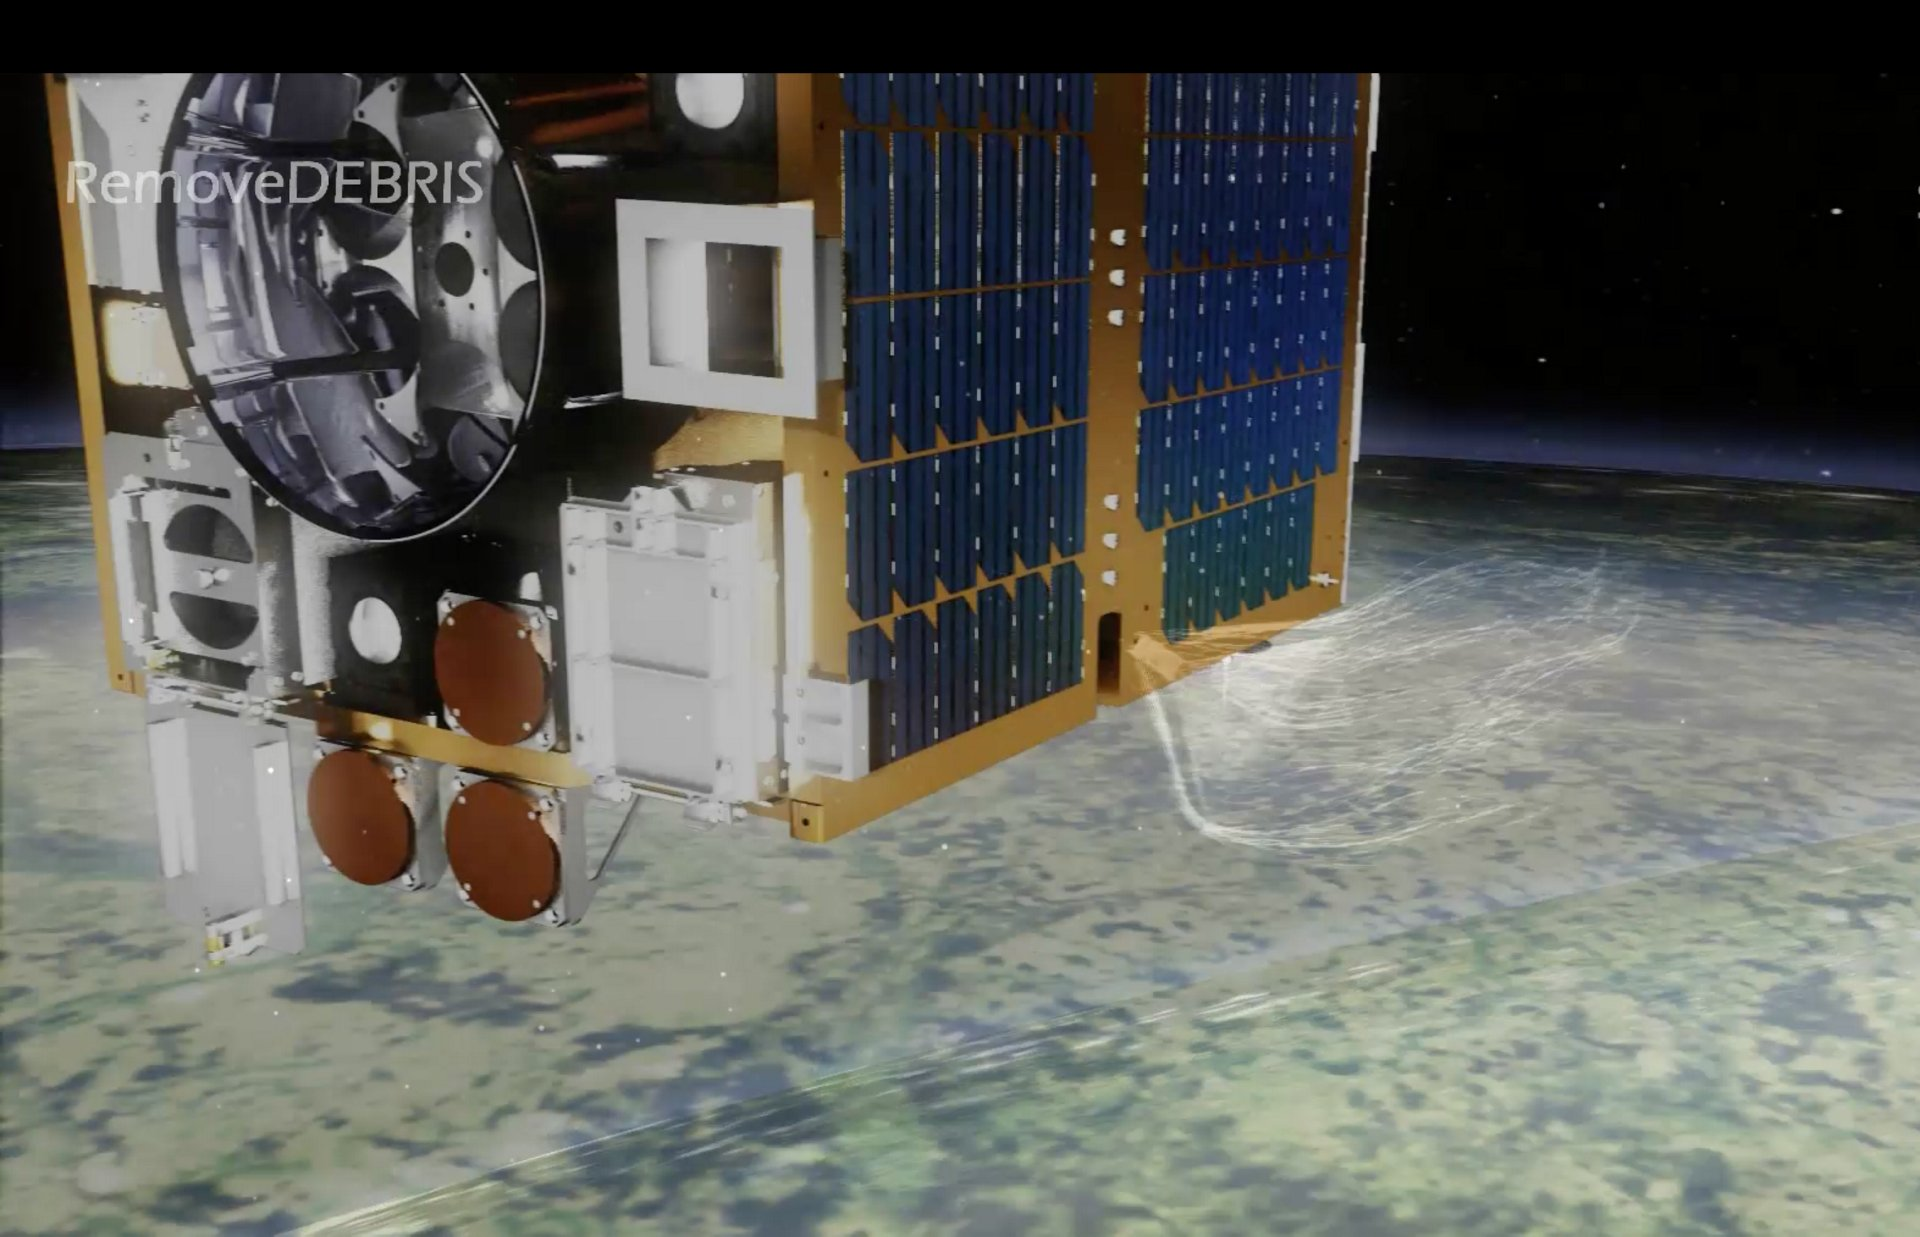 RemoveDEBRIS Demonstrator Satellite